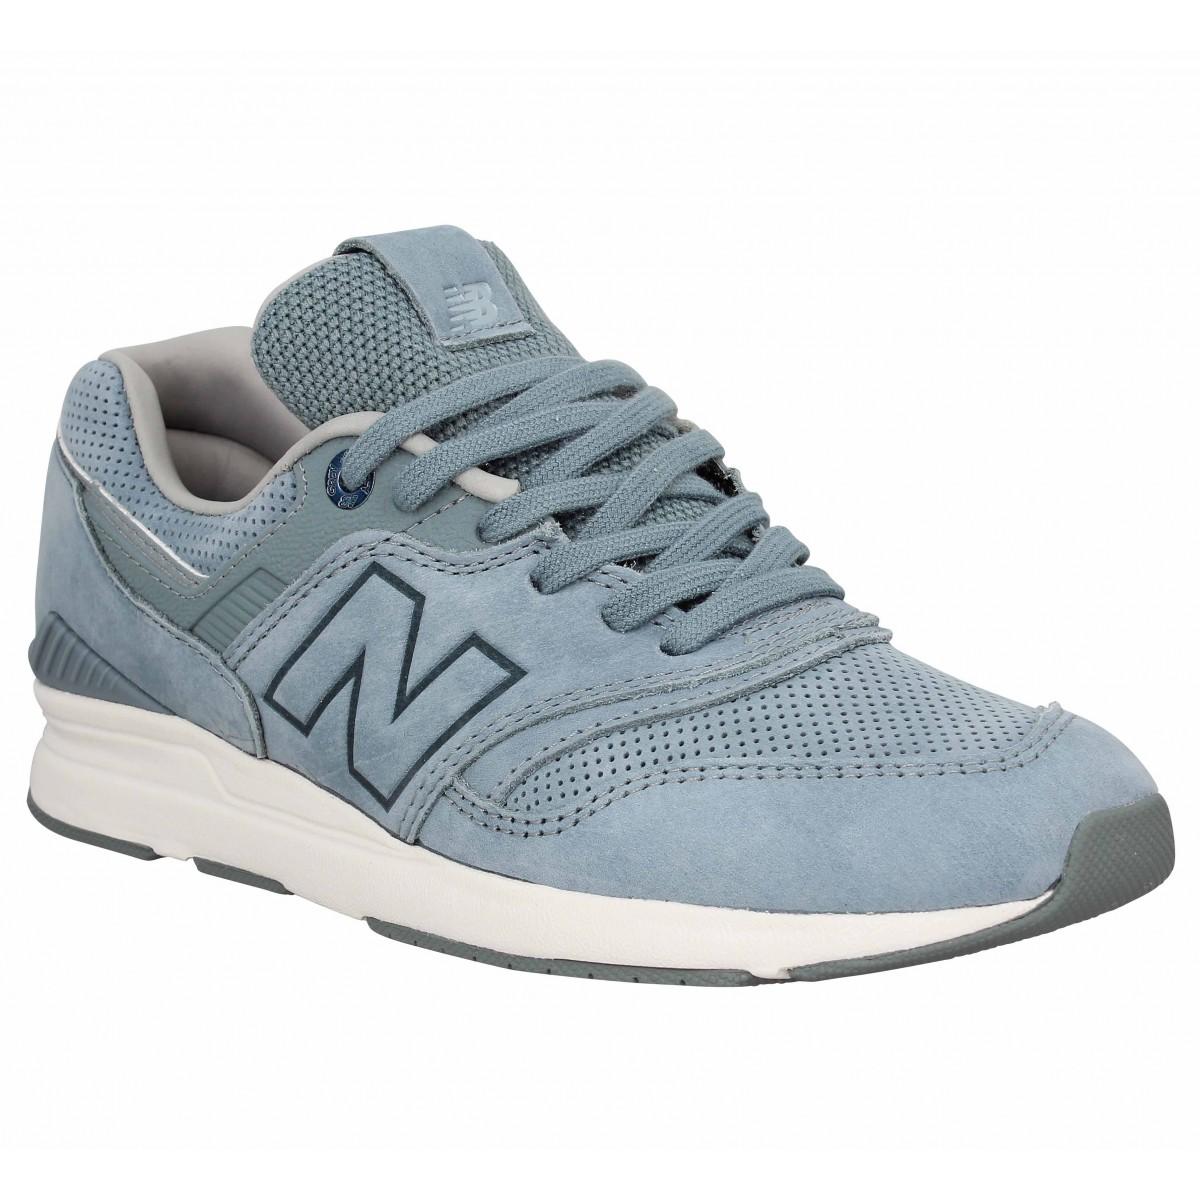 New Balance Femme Wl 697 Nubuck -39-bleu